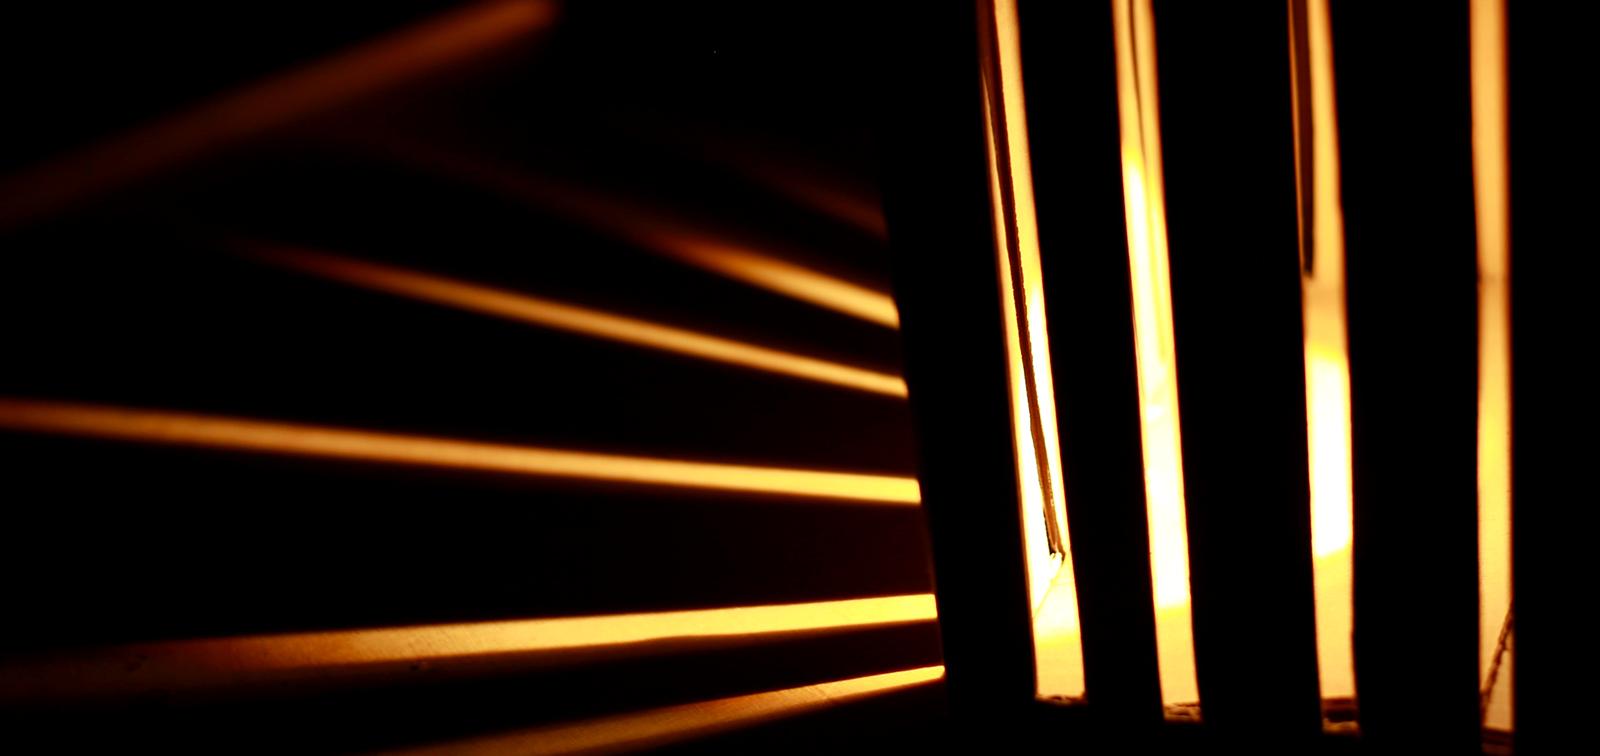 Proyecto <i>Grietas de luz</i>